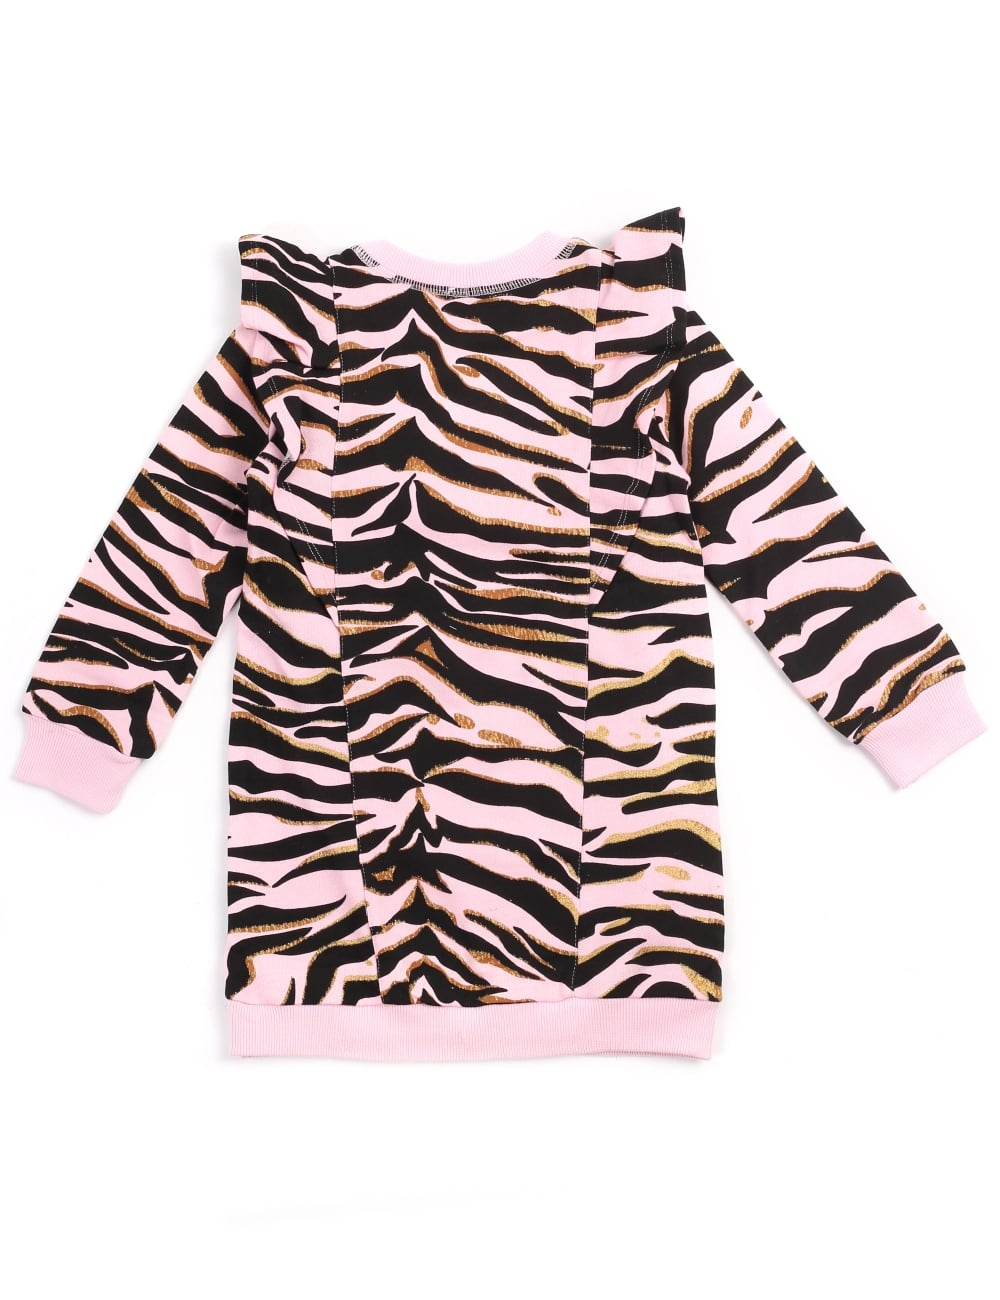 853398b92 Kenzo Girls Tiger 12 SweaterDress